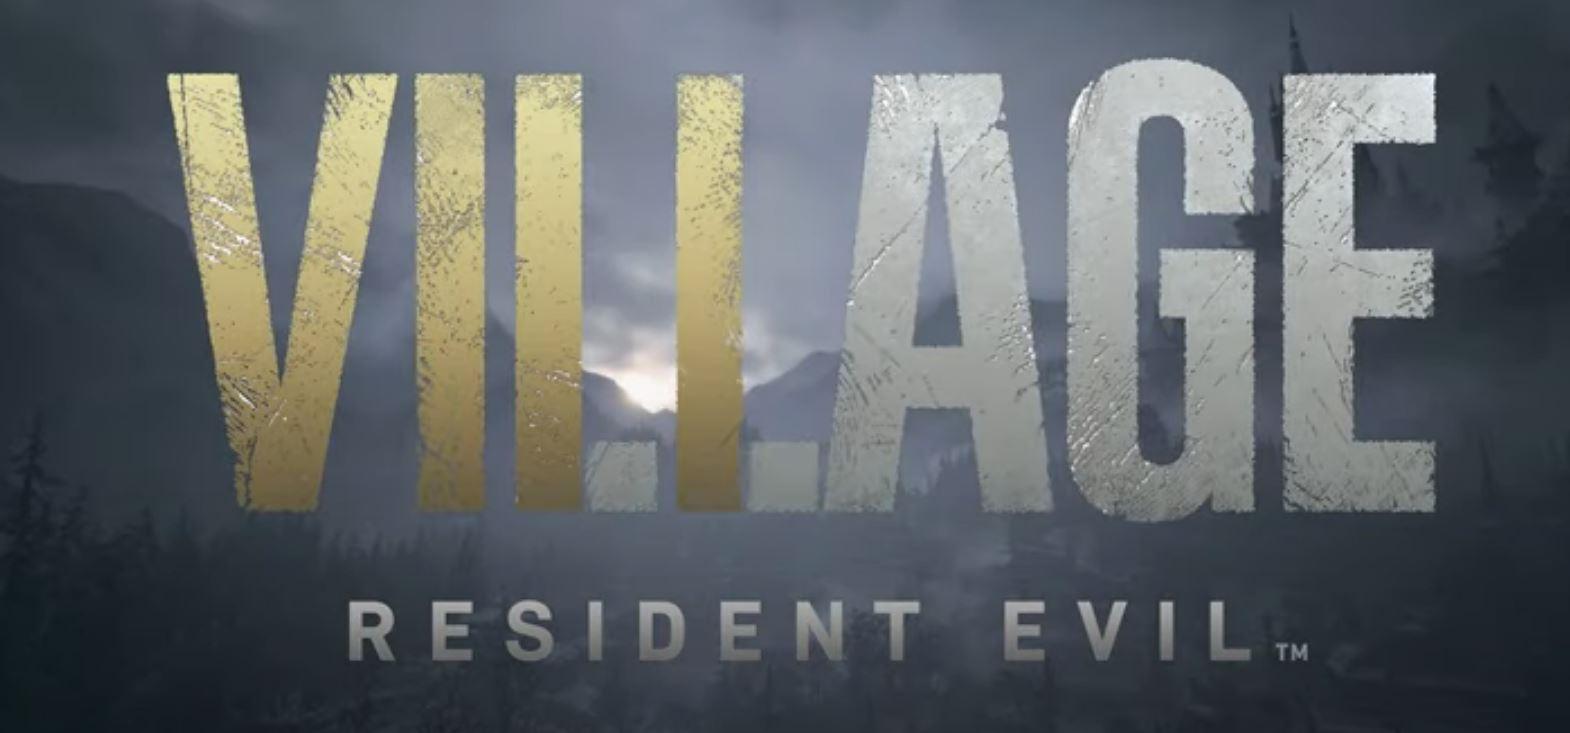 banner image for resident evil village